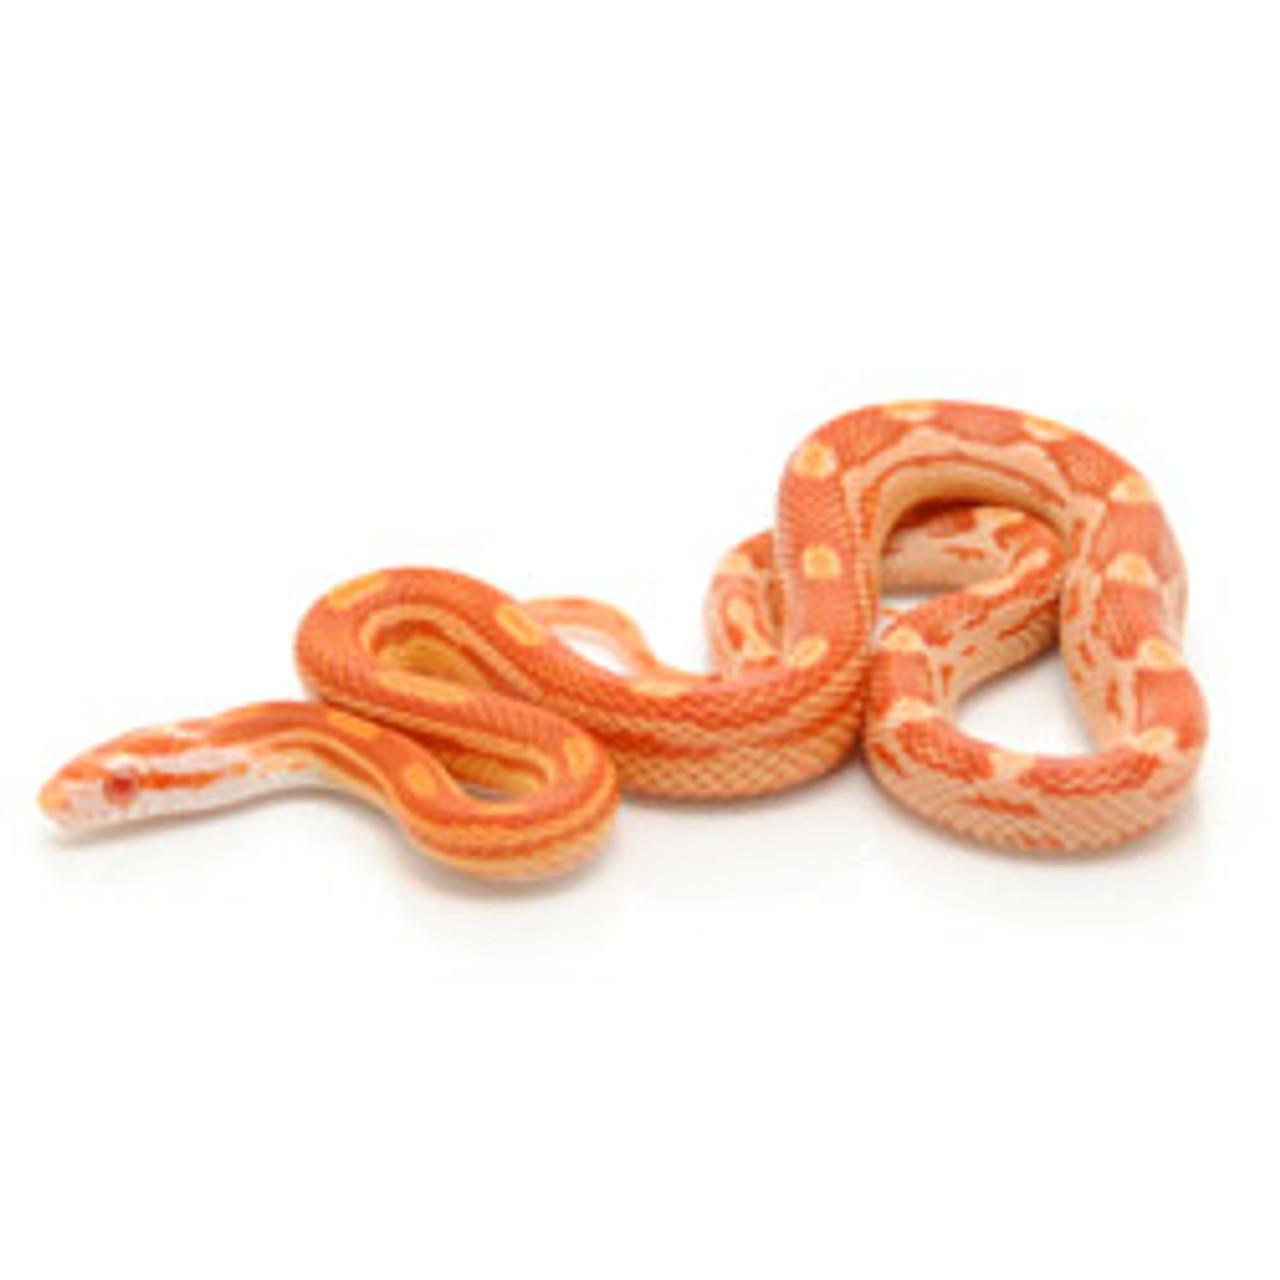 Albino Motley Corn Snake (Pantherophis guttata)